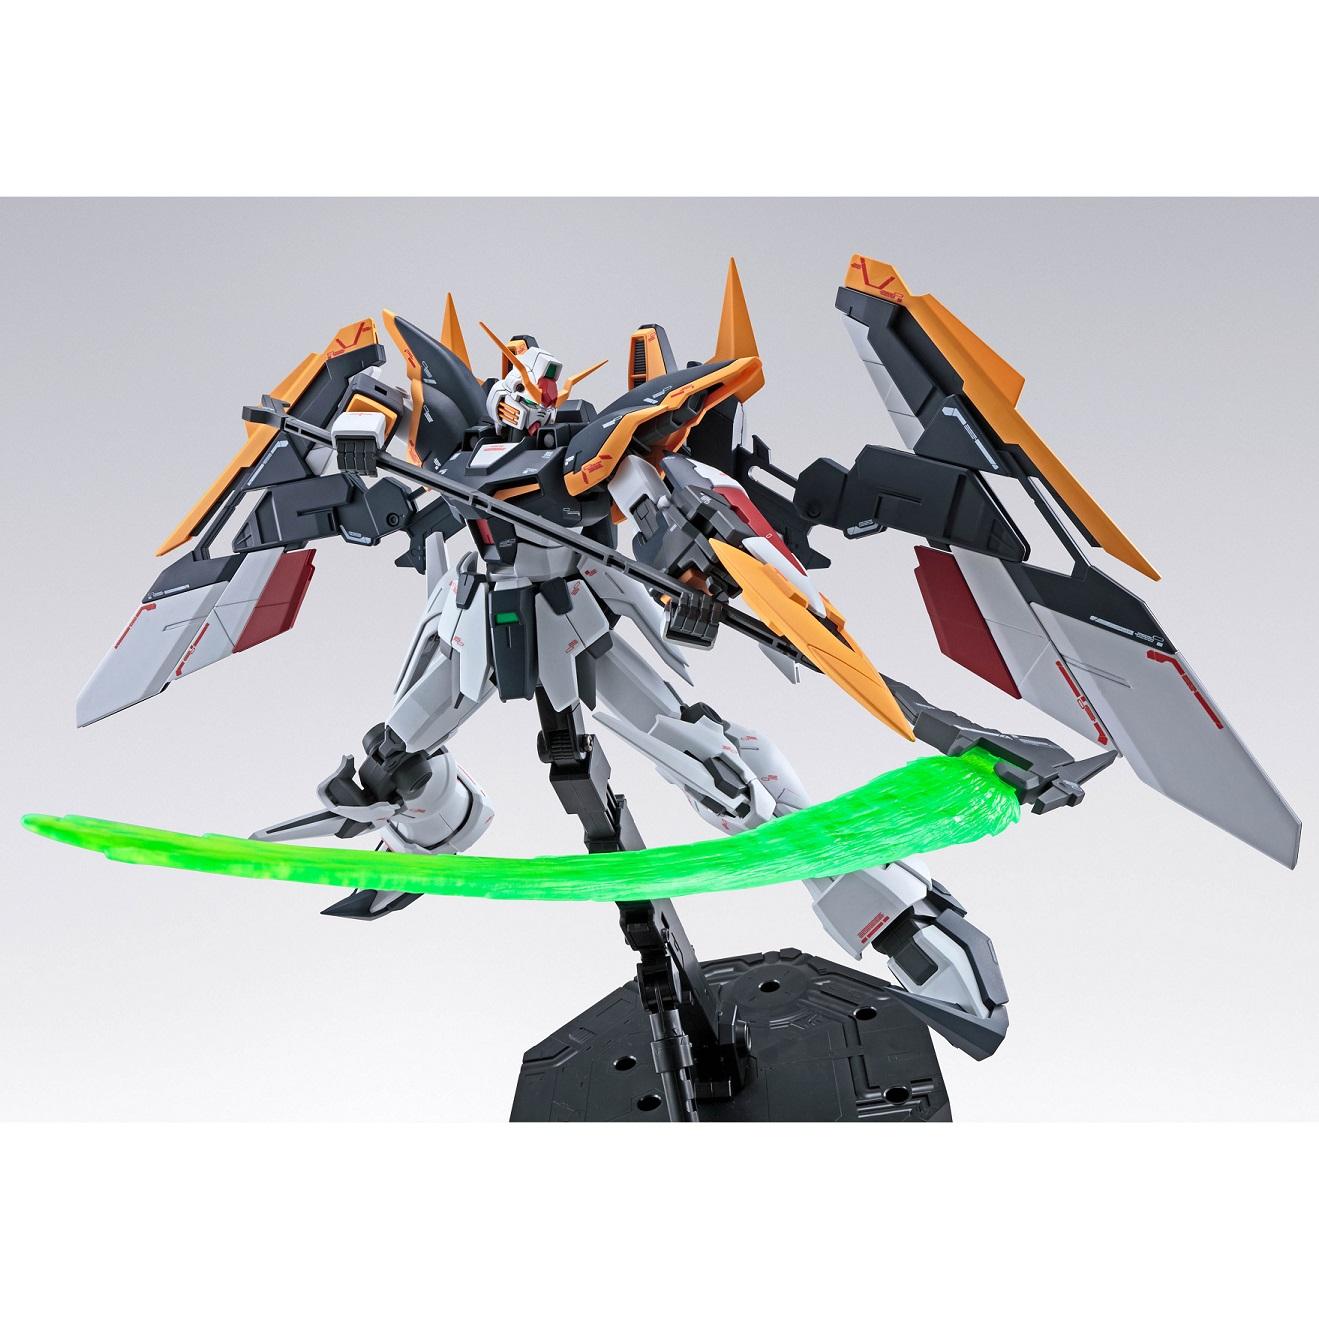 Bandai Hobby #03 1//100 Model W Series Deathscythe High Grade Gundam Action Figure